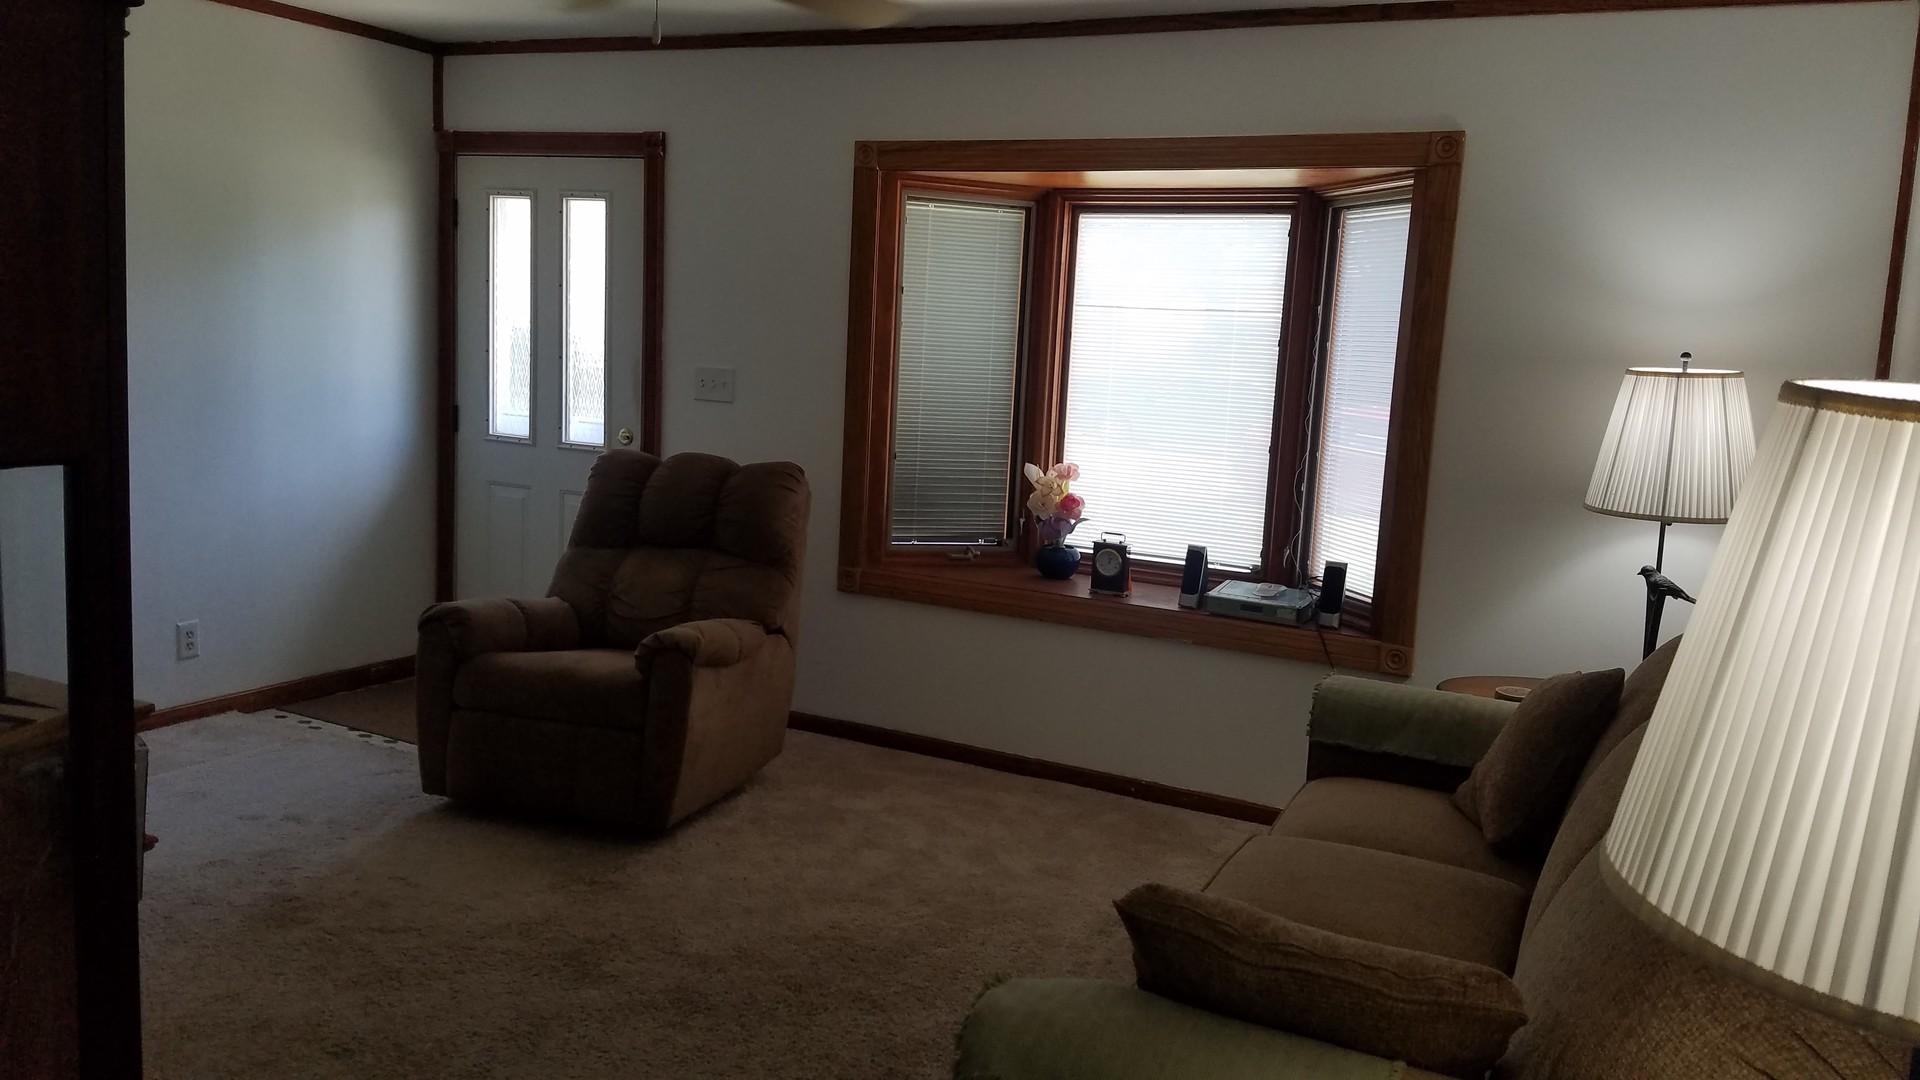 422 CEDARCREST, STREAMWOOD, Illinois, 60107